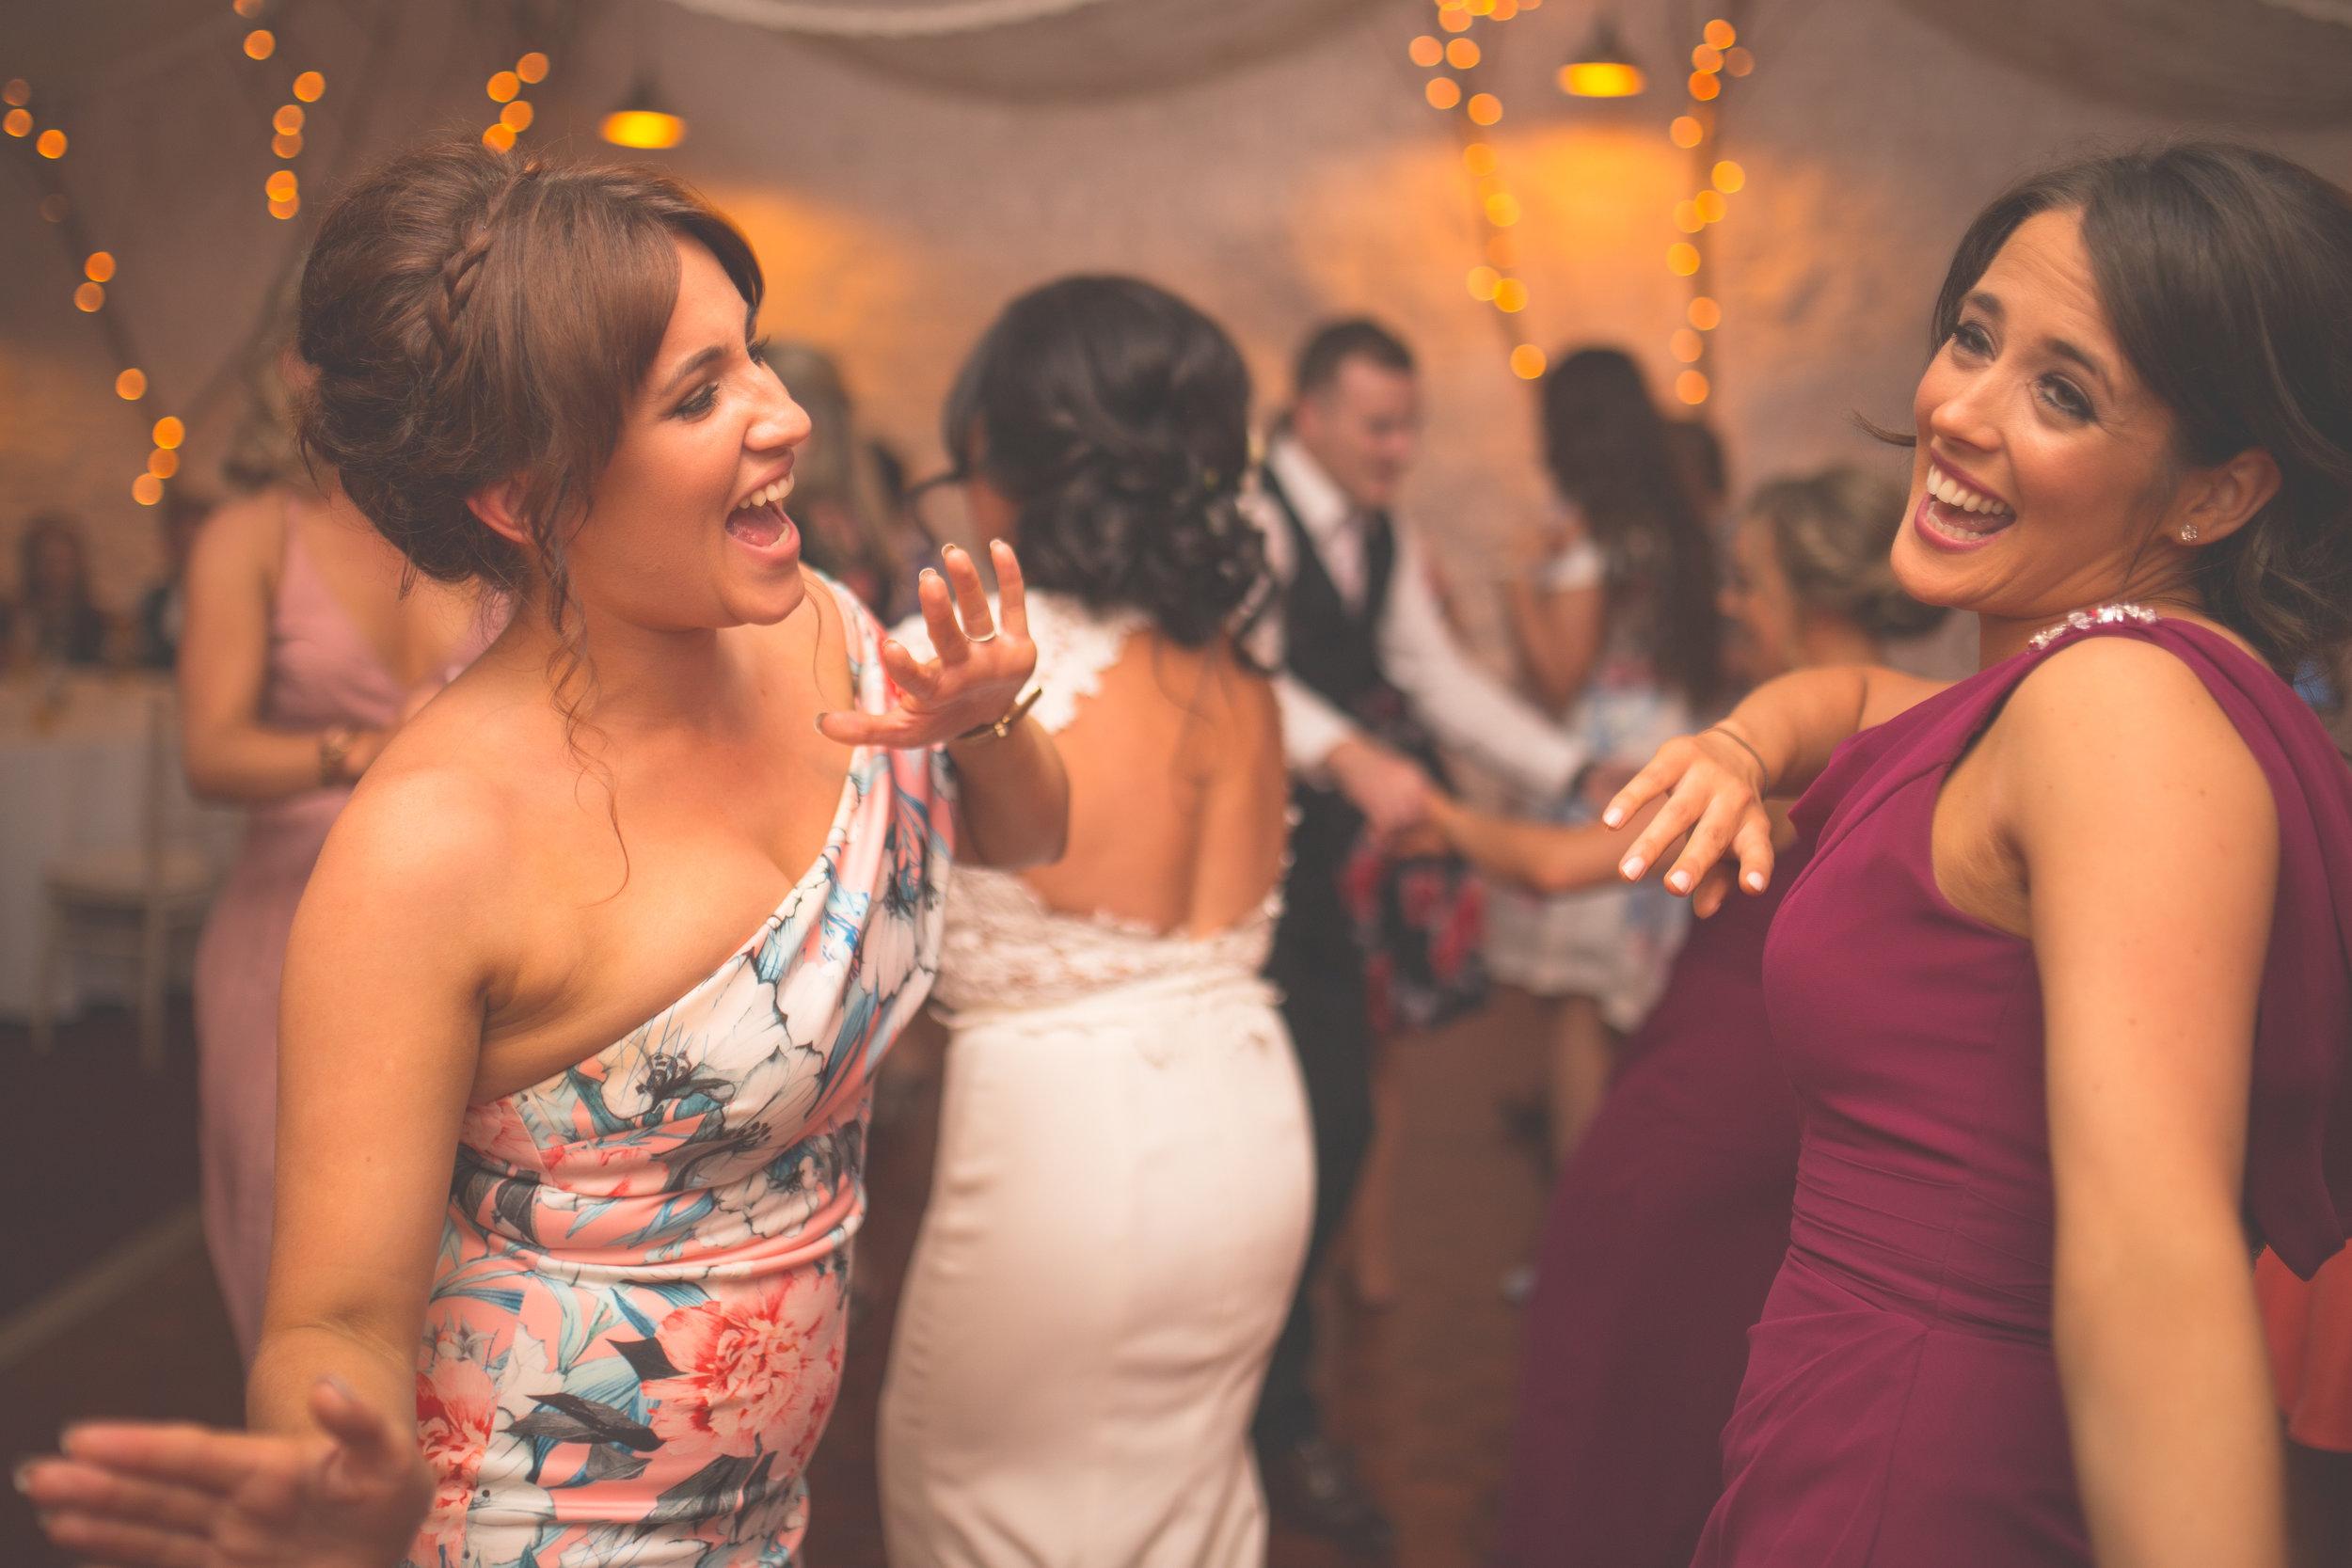 Brian McEwan Wedding Photography | Carol-Annee & Sean | The Dancing-86.jpg